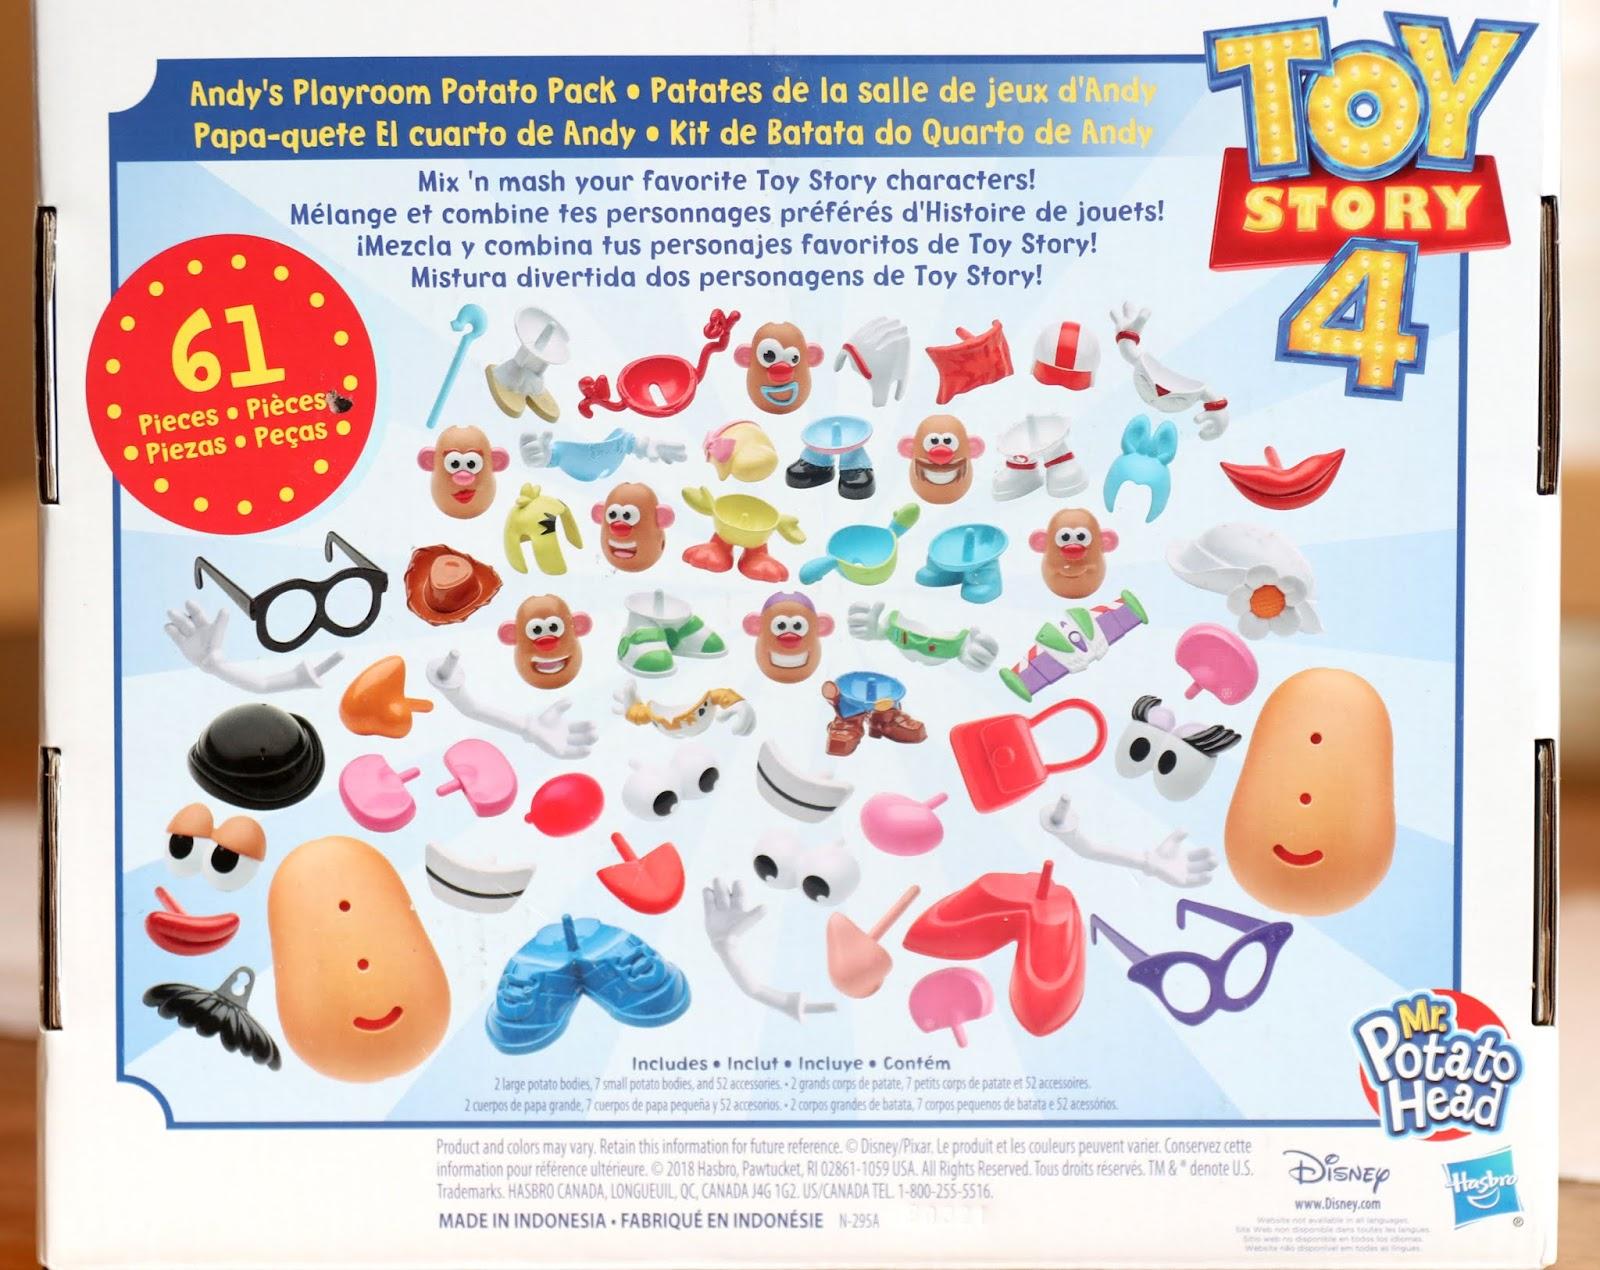 Dan The Pixar Fan Toy Story 4 Mr Potato Head Andy S